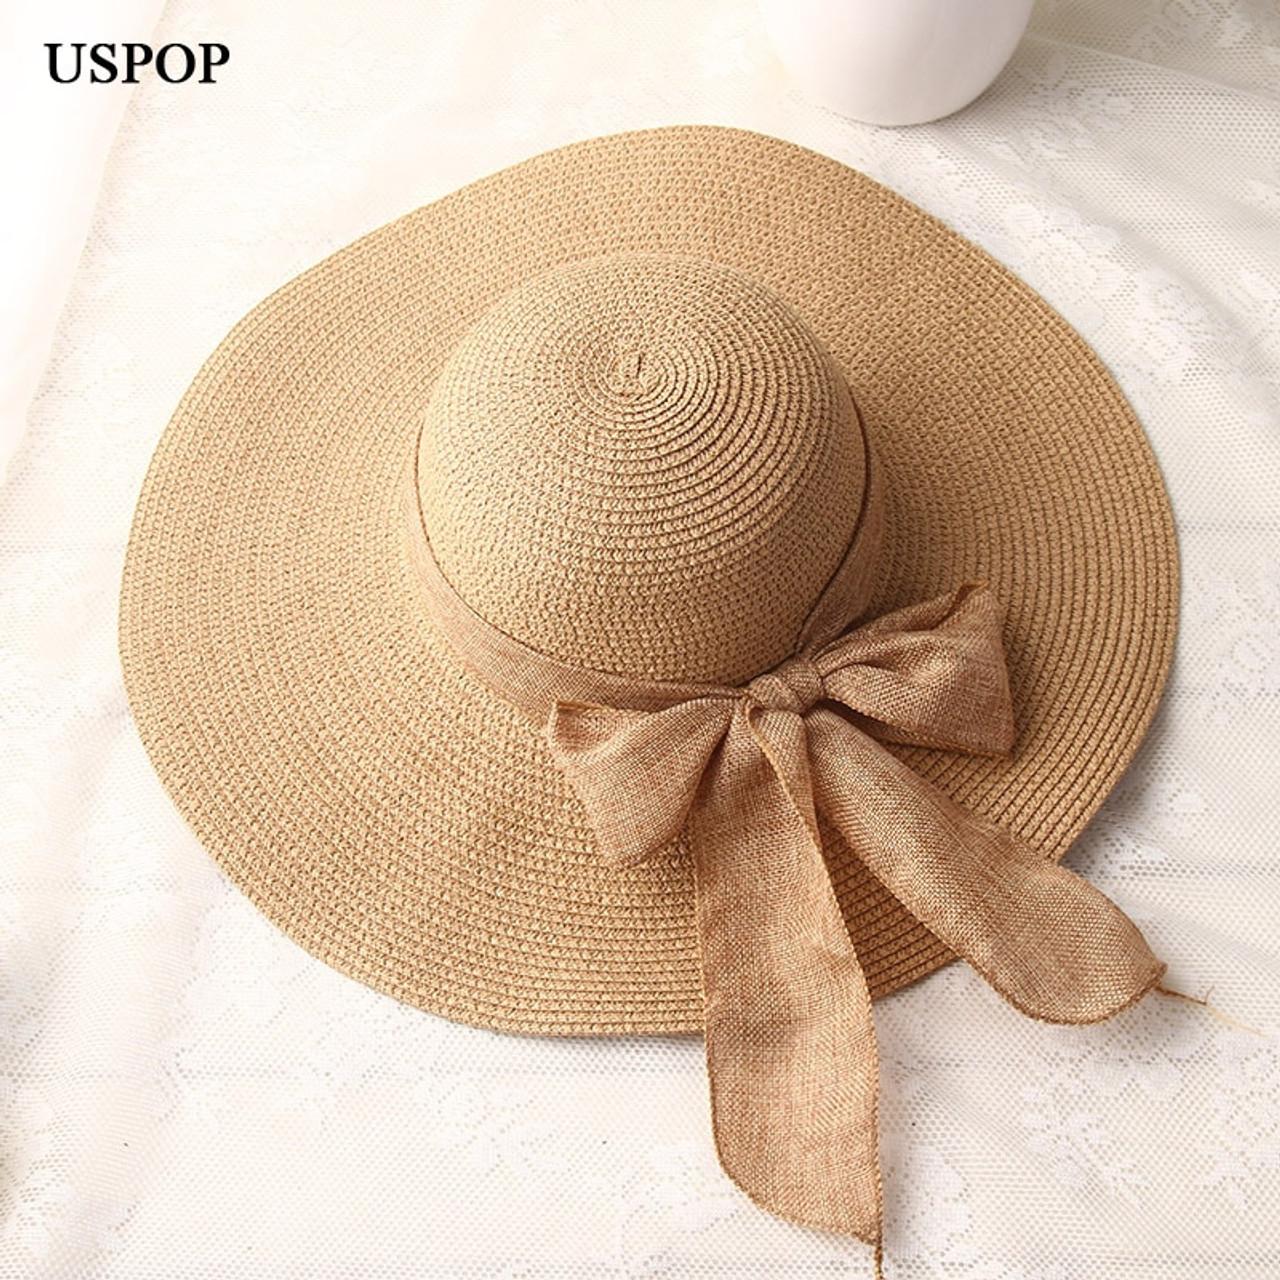 81433761 USPOP 2019 fashion women sun hats hand made straw hat female ribbon  bow-knot wide ...